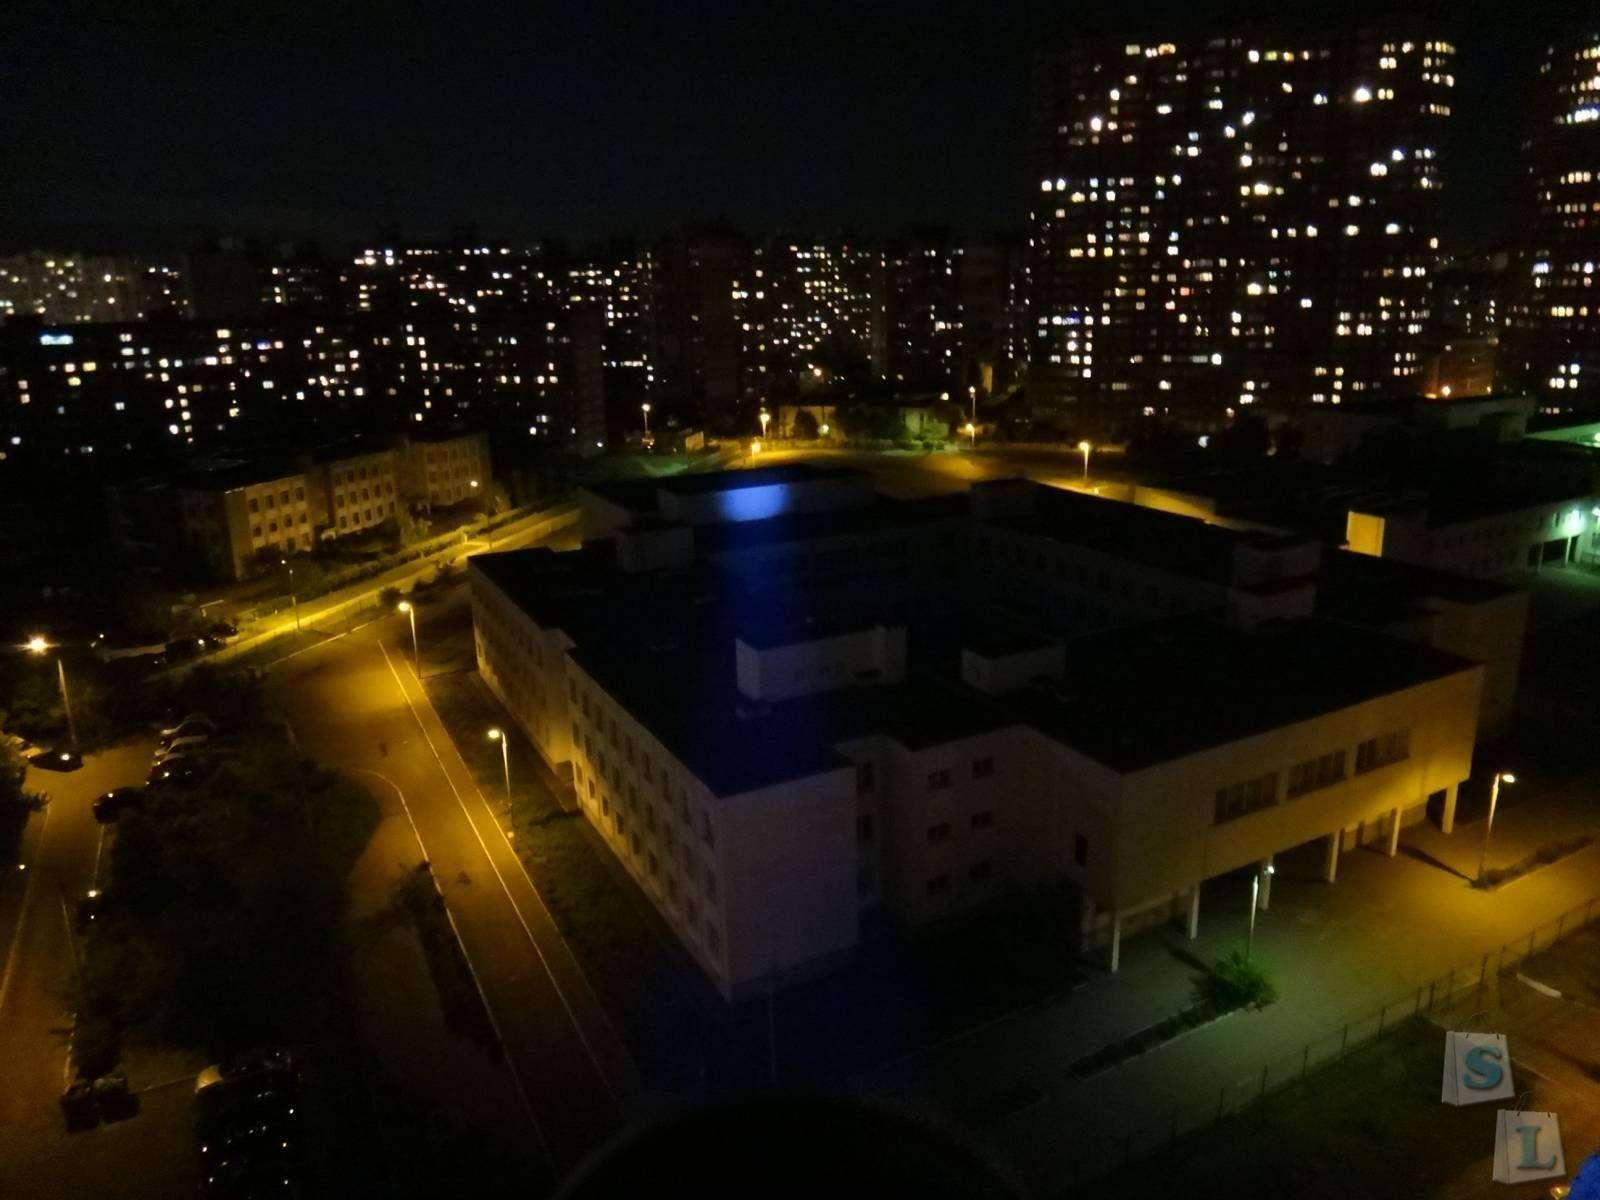 Aliexpress: Обзор поискового фонаря фары Romisen RC-868 на CREE XPG - 800 люмен